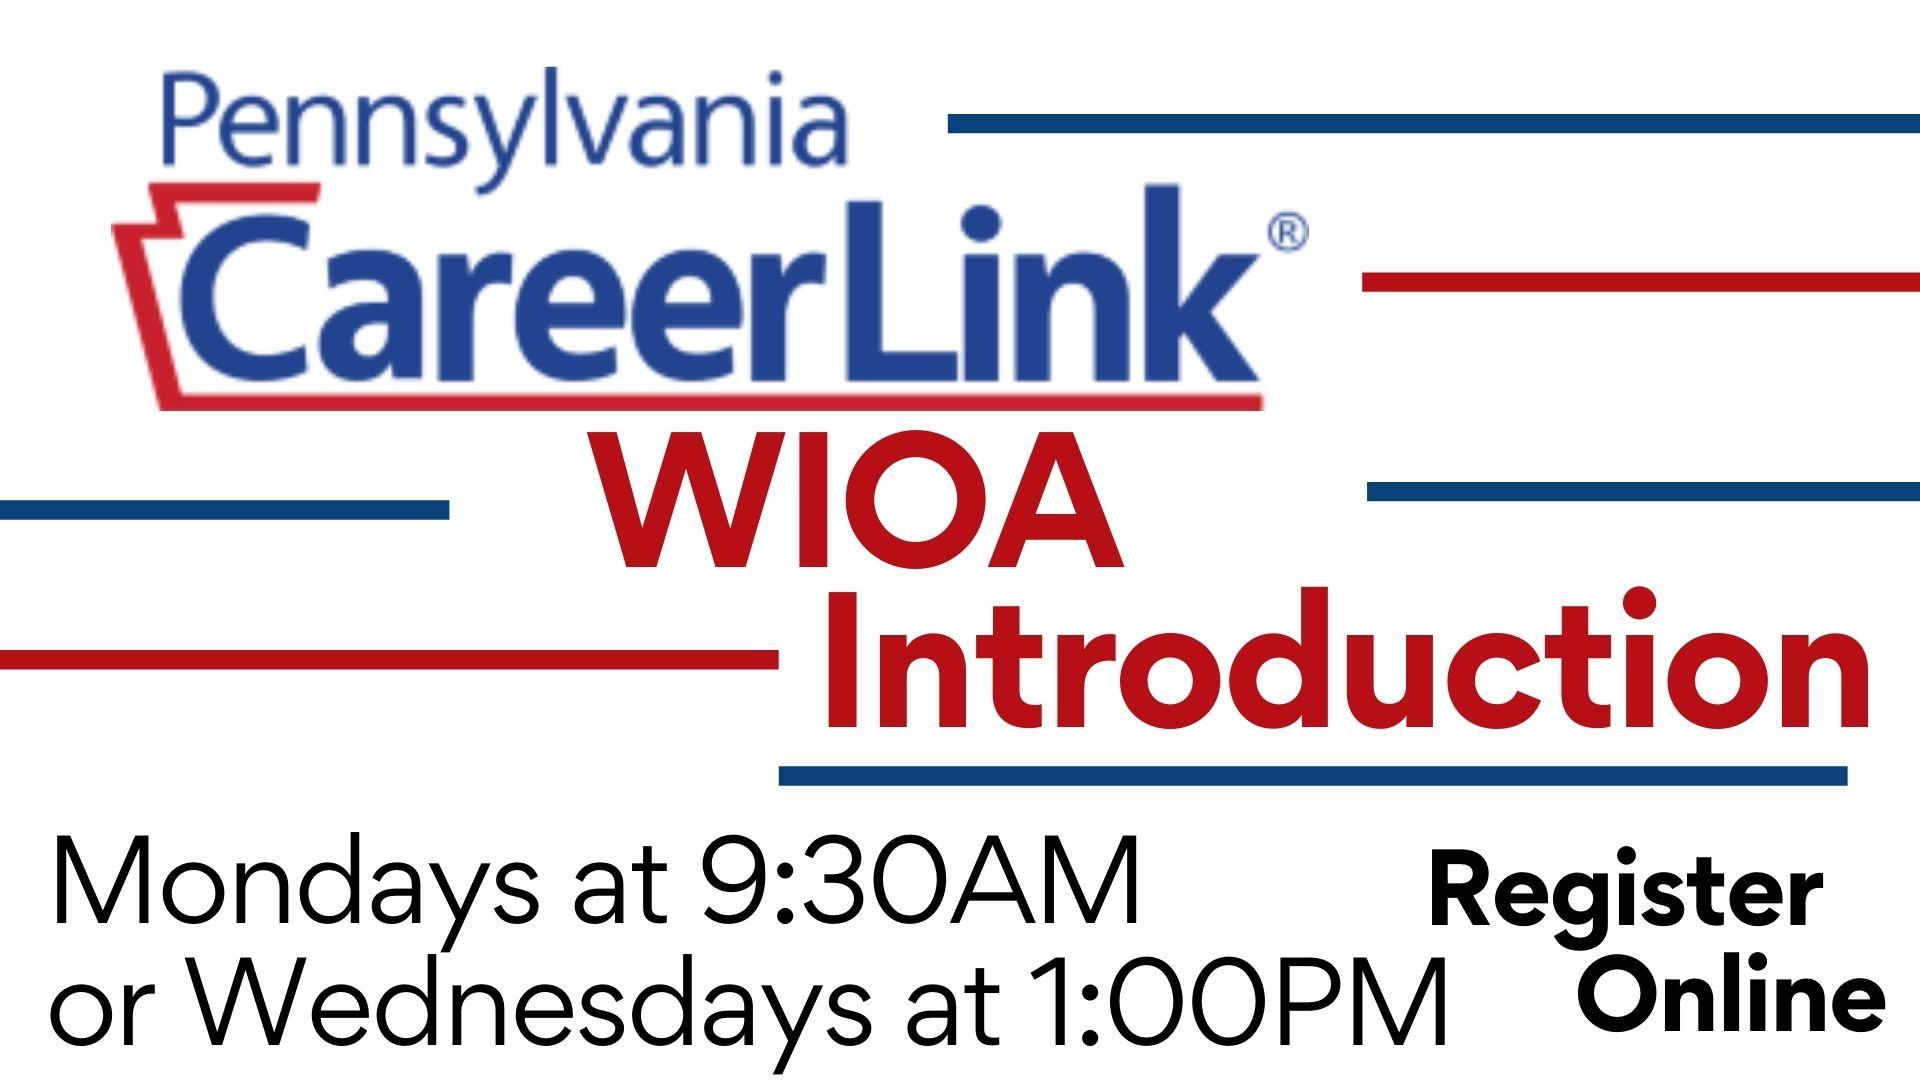 PA CareerLink: WIOA Introduction